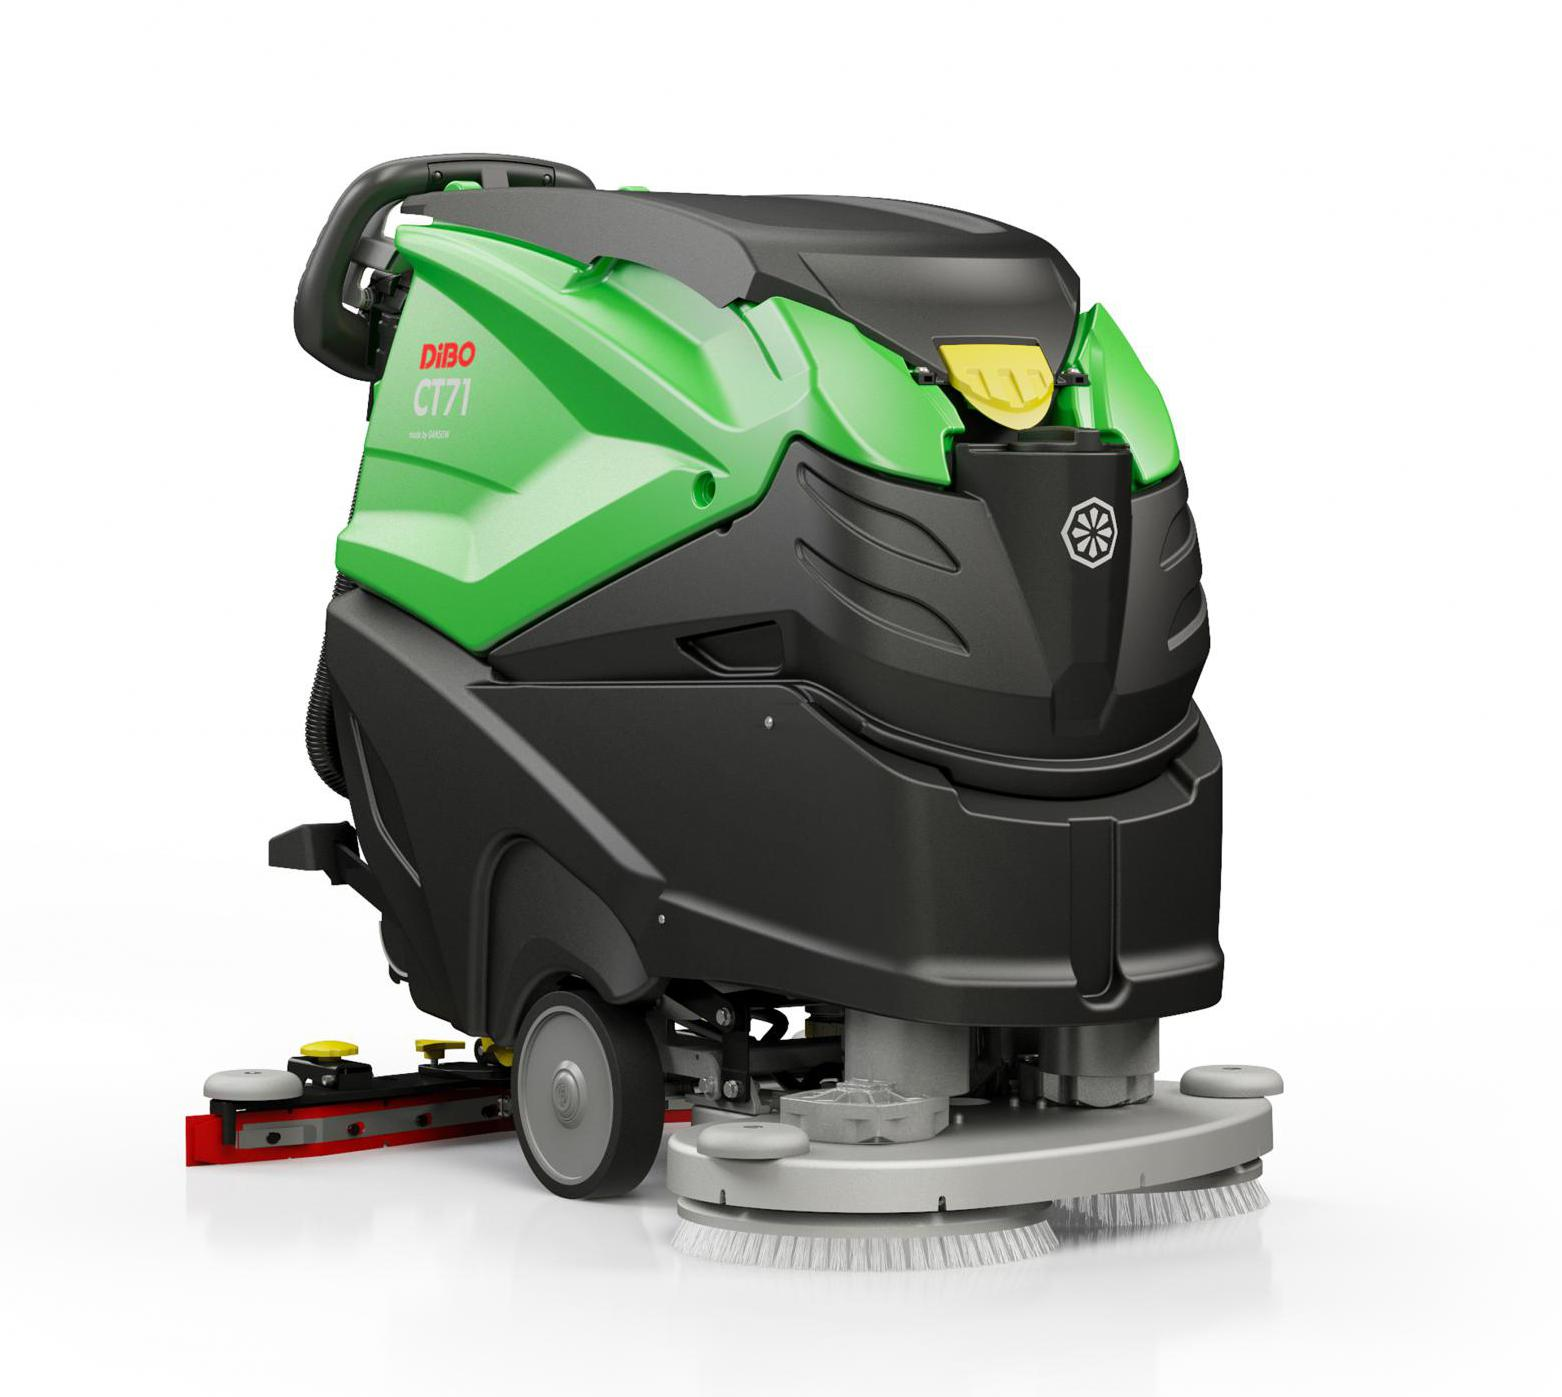 dibo-ct71-walk-behind-scrubber